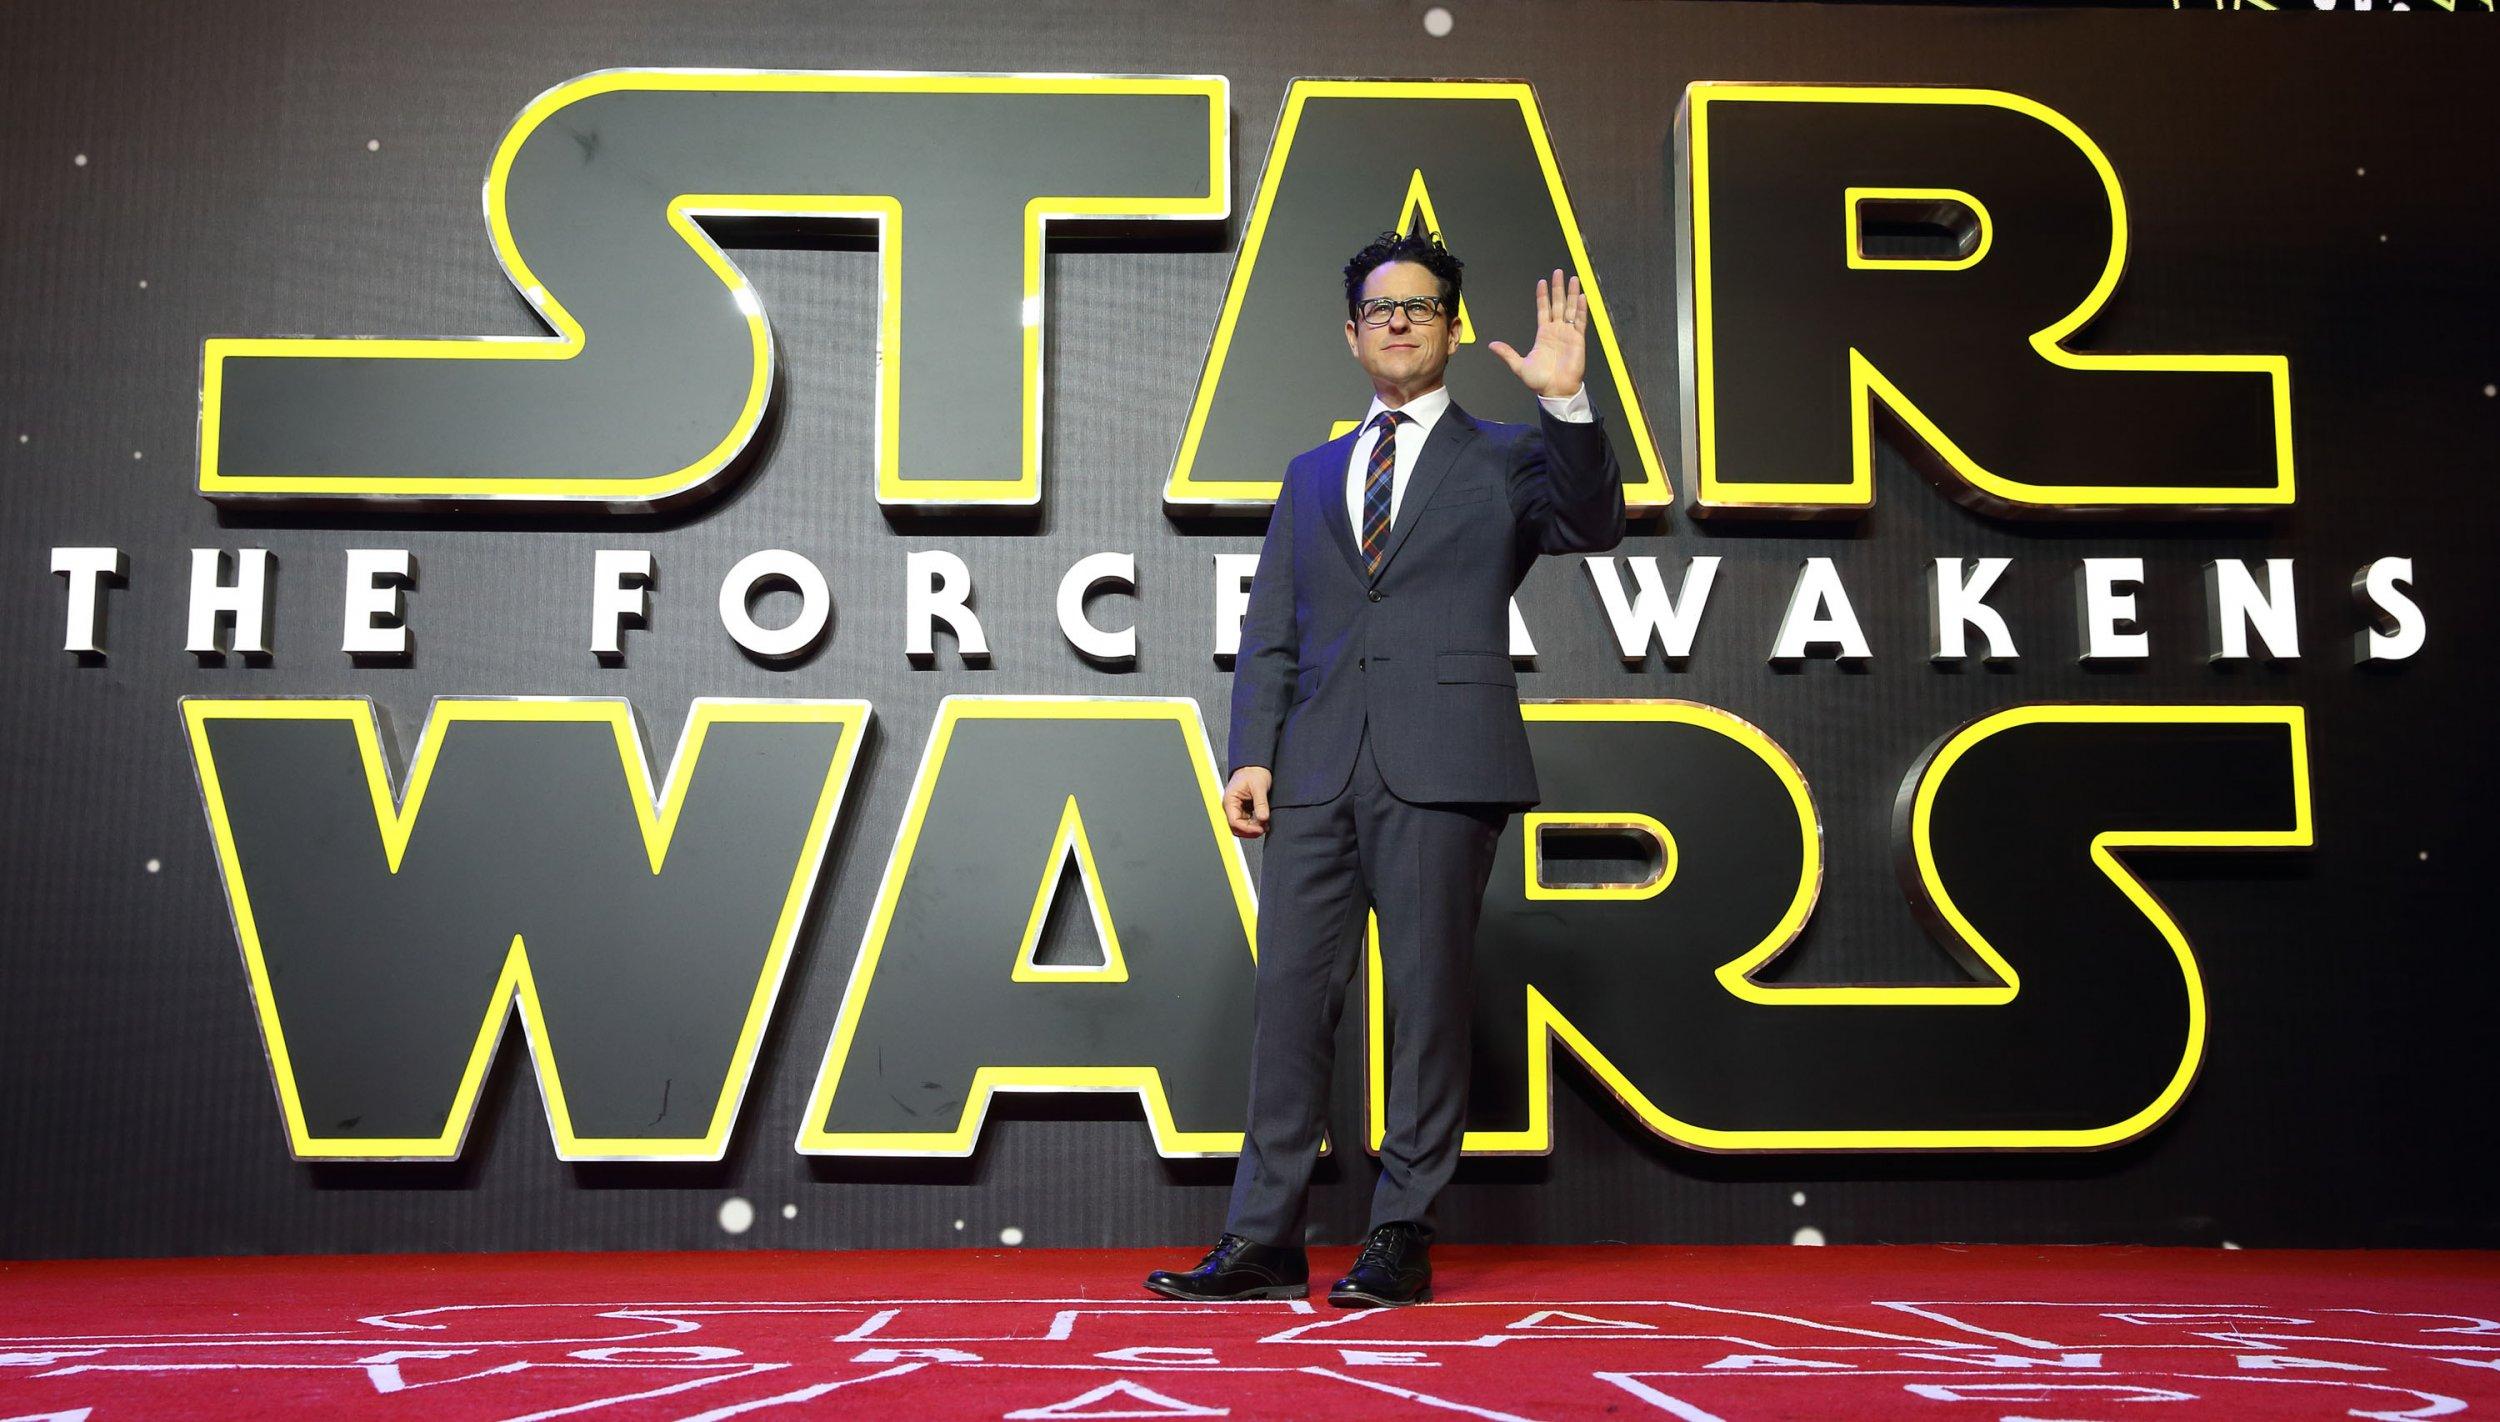 J.J. Abrams to direct Star Wars